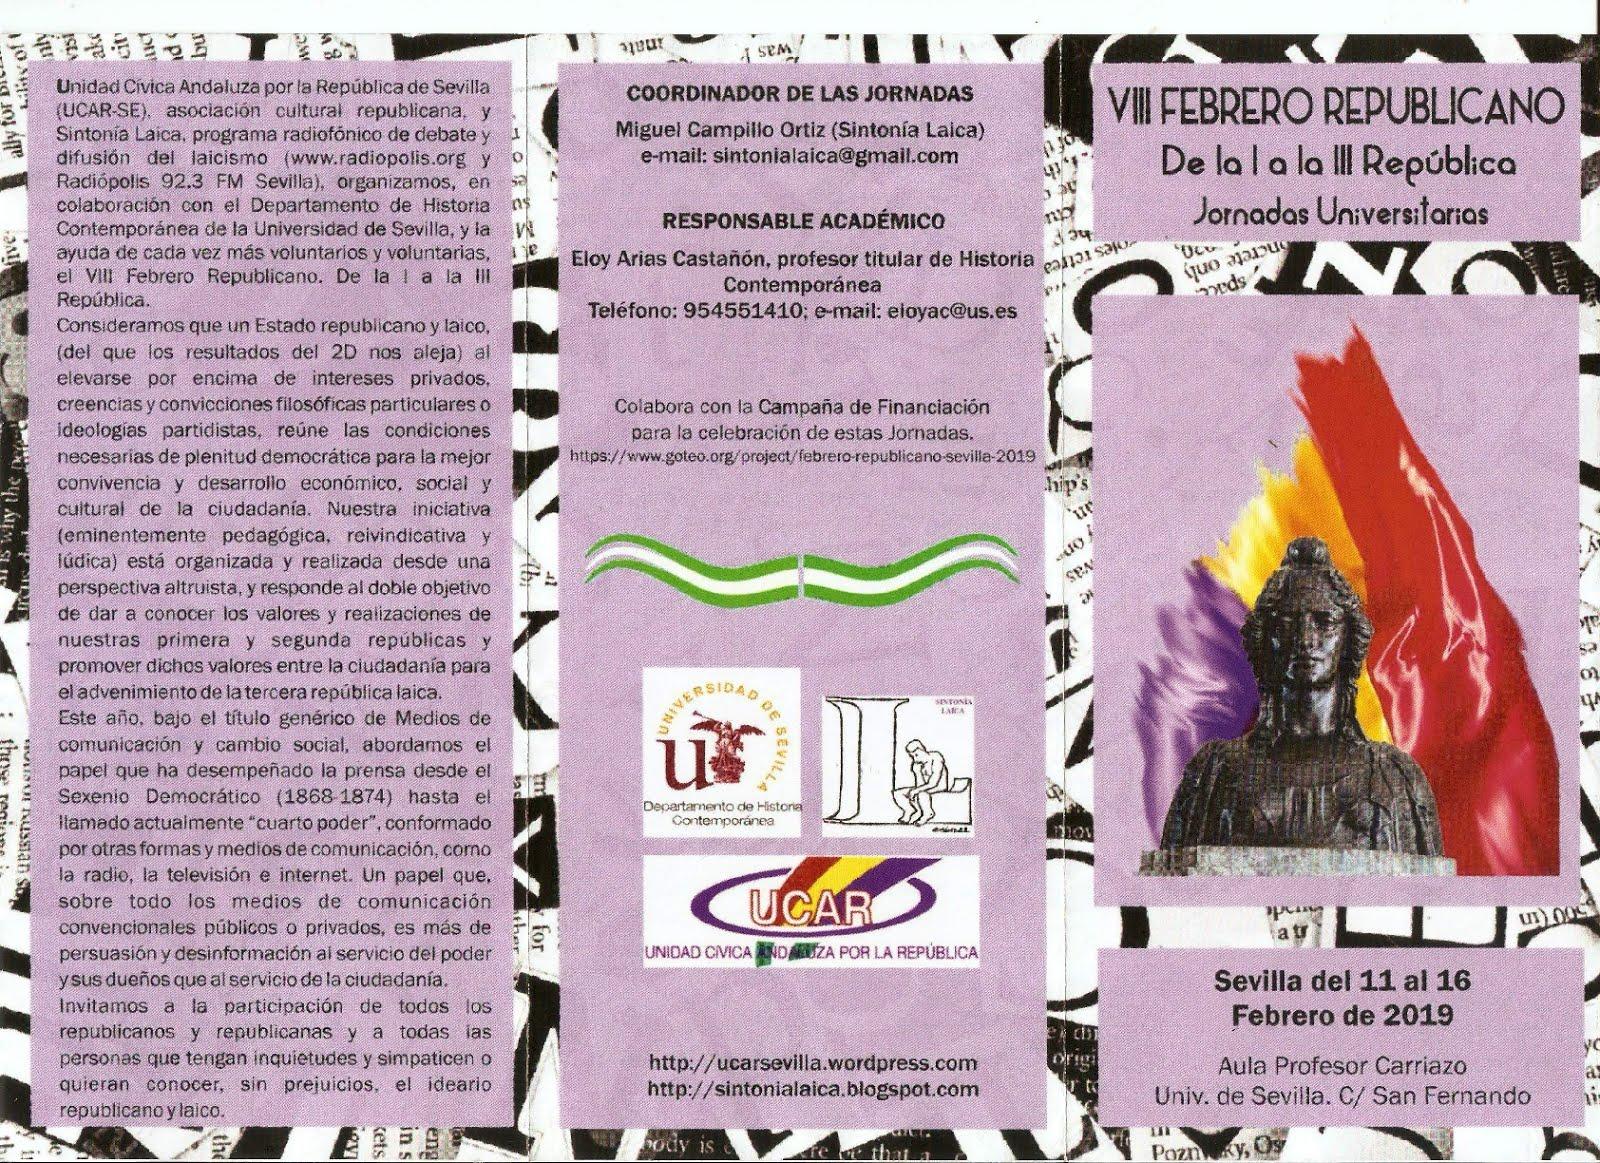 VIII FEBRERO REPUBLICANO. Jornadas Universitarias.